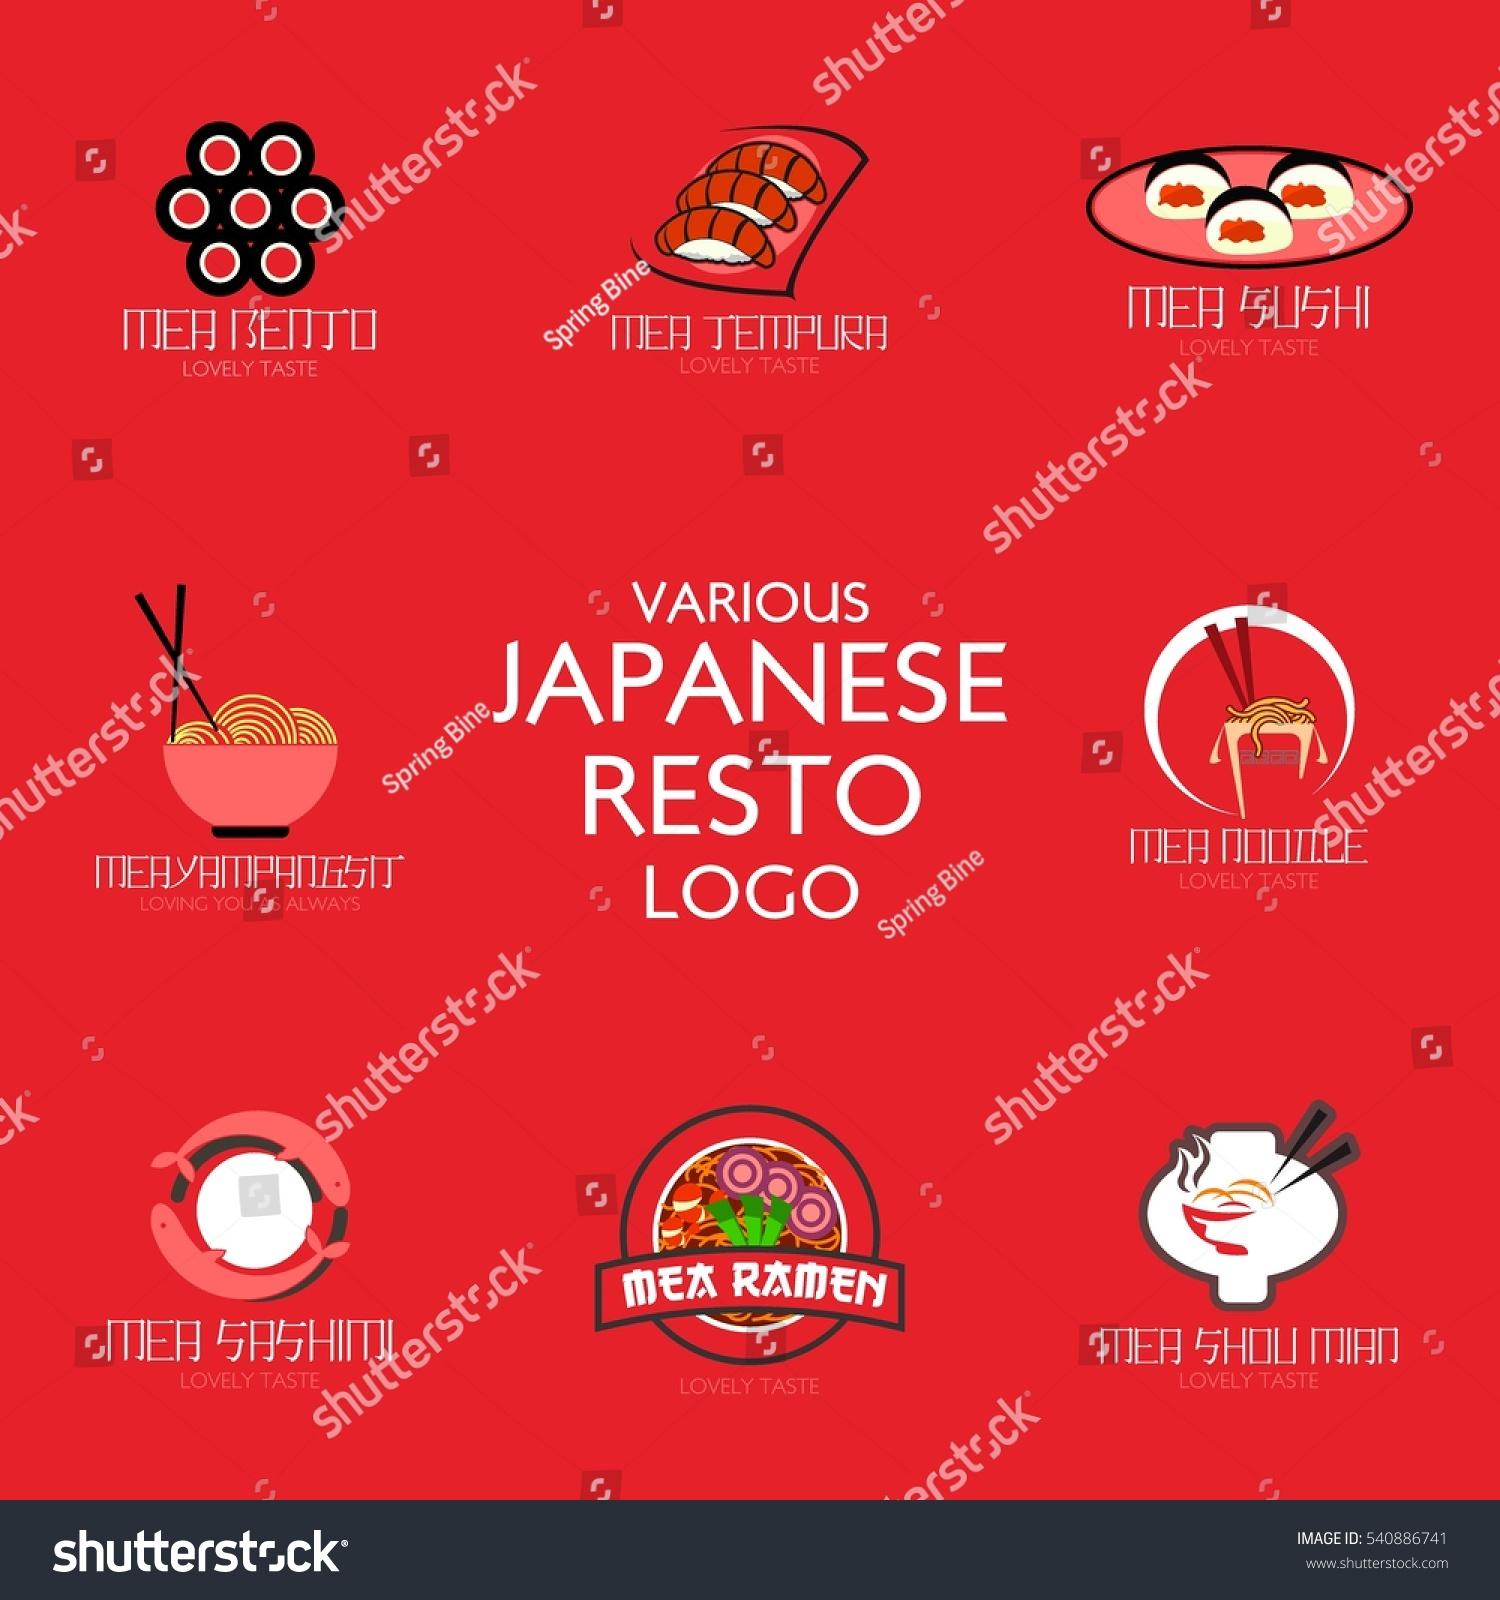 Vector De Stock Libre De Regalias Sobre Traditional Japanese Food Restaurant Logo Design540886741